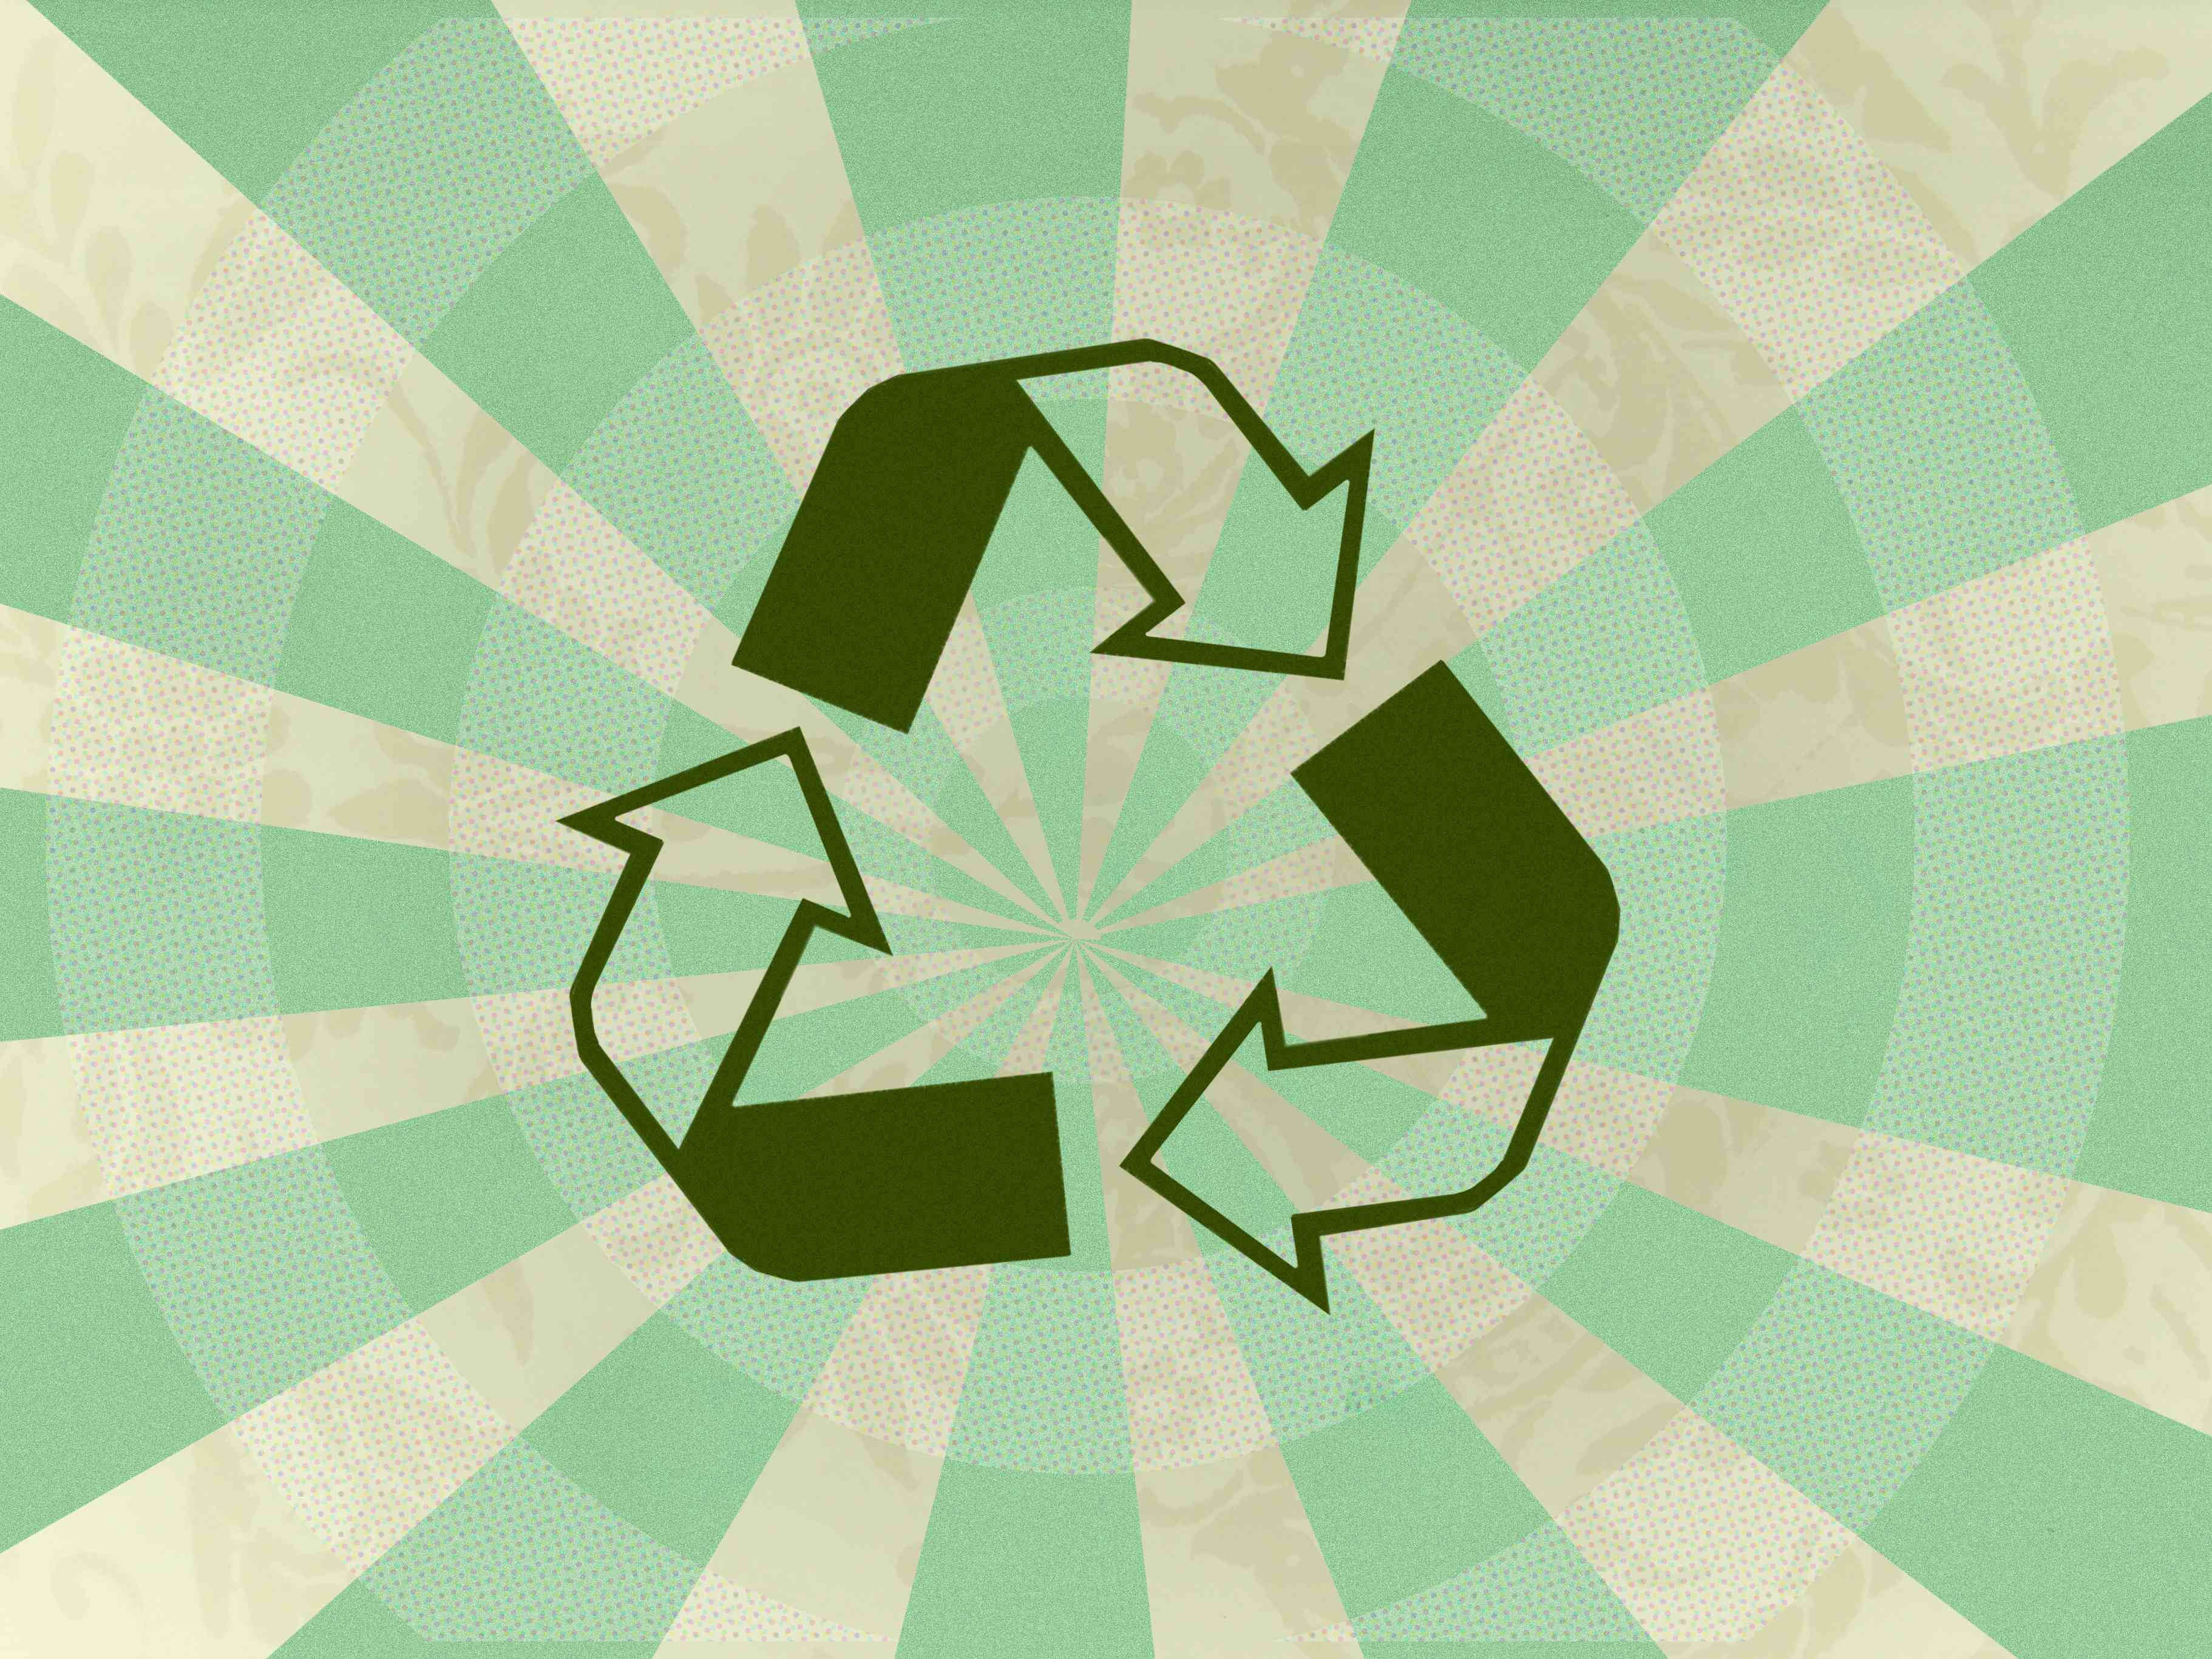 A green recycling symbol.